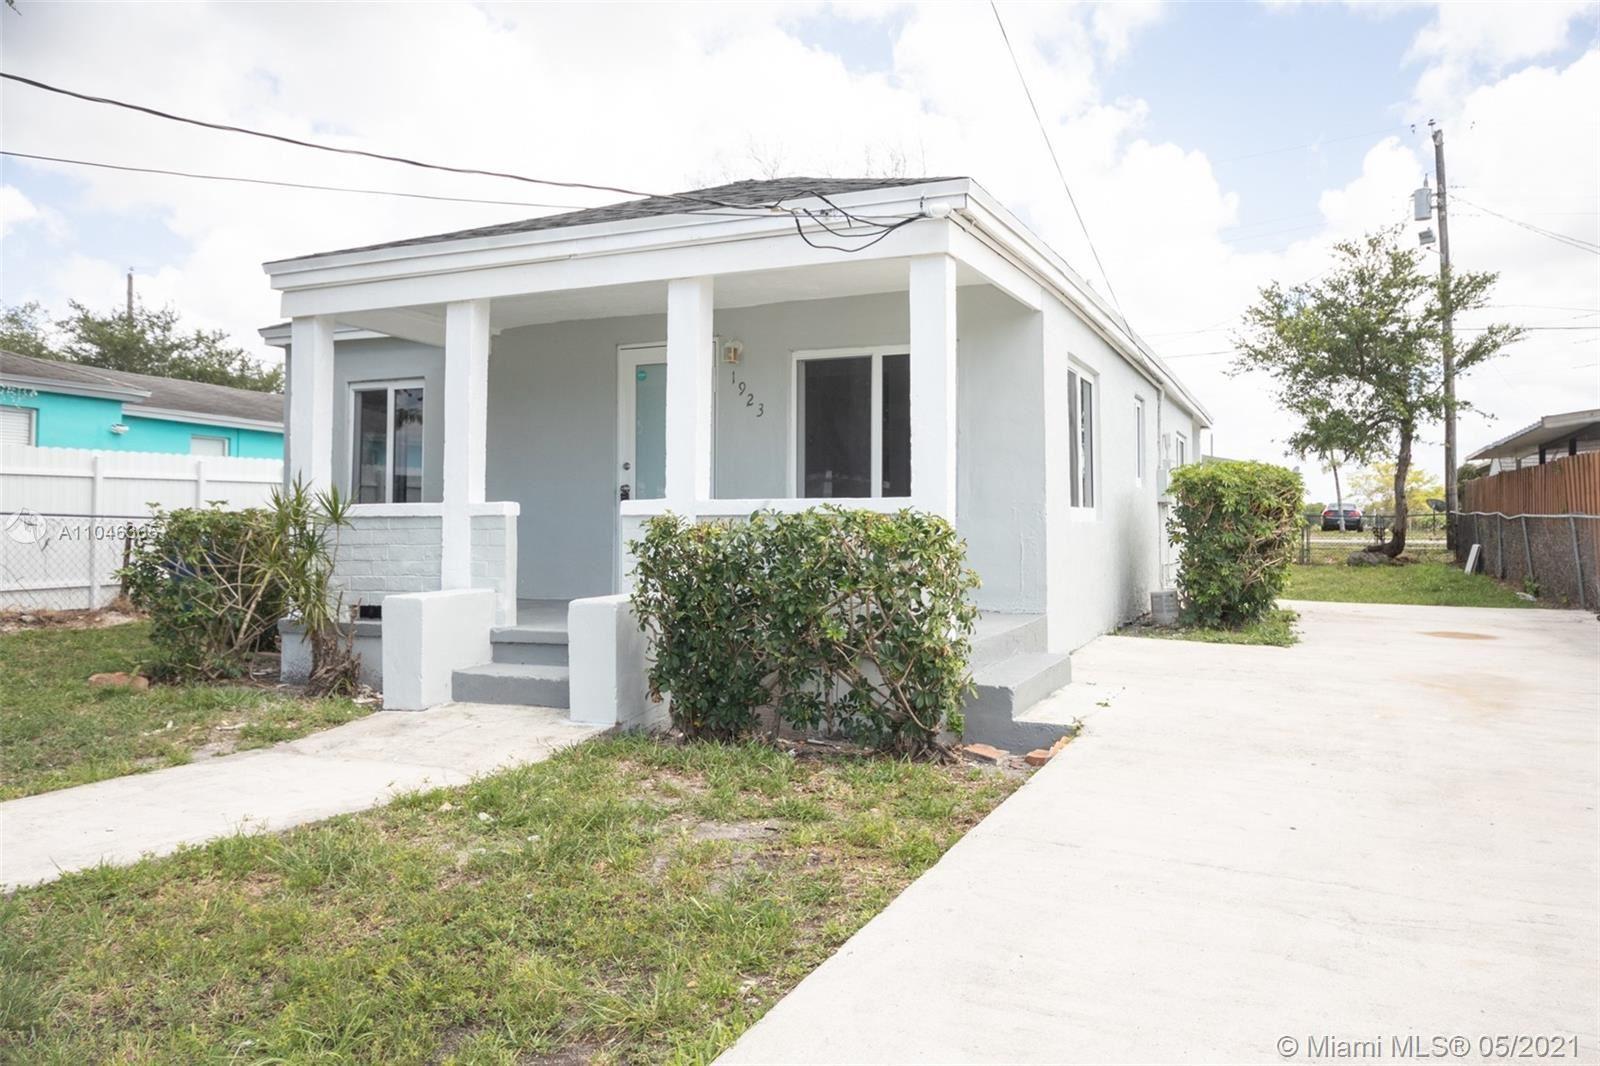 1923 NW 154th St, Miami Gardens, FL 33054 - #: A11046365